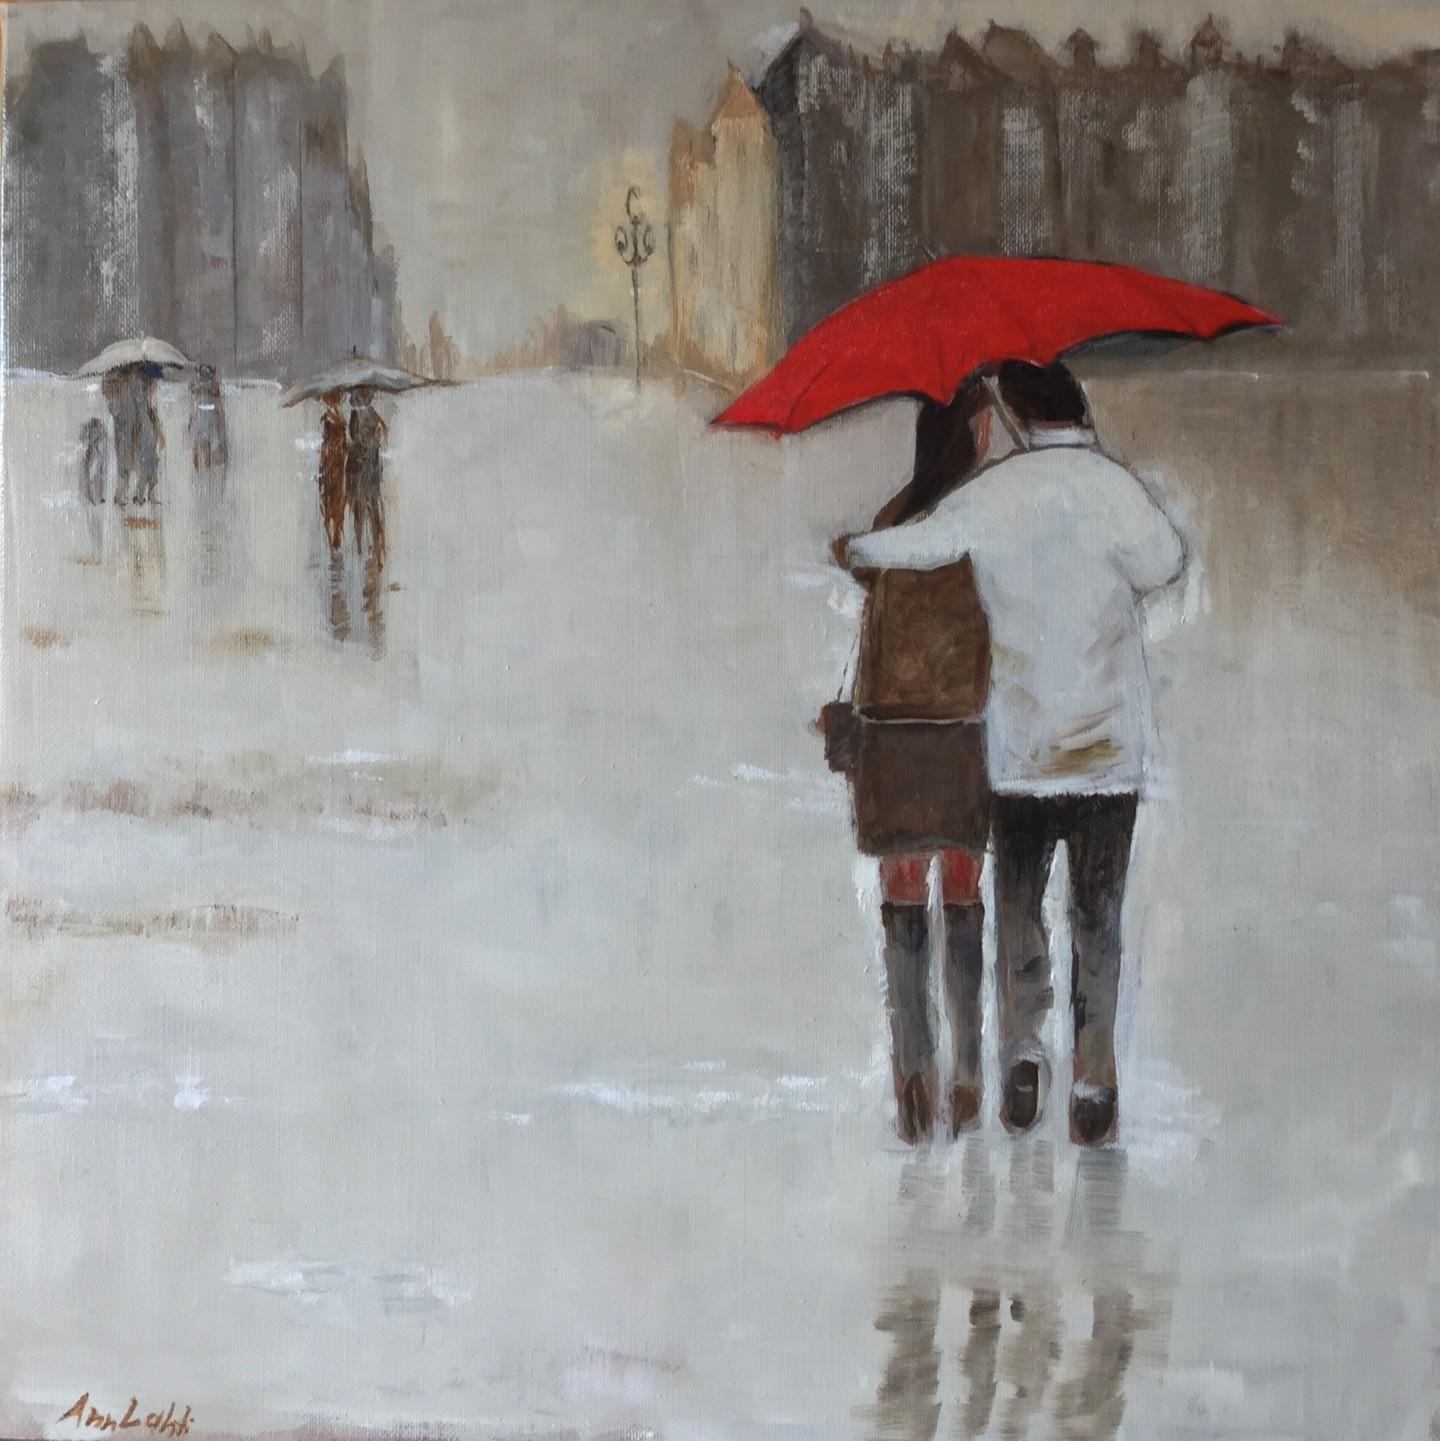 Ann Lahti - On A Rainy Day